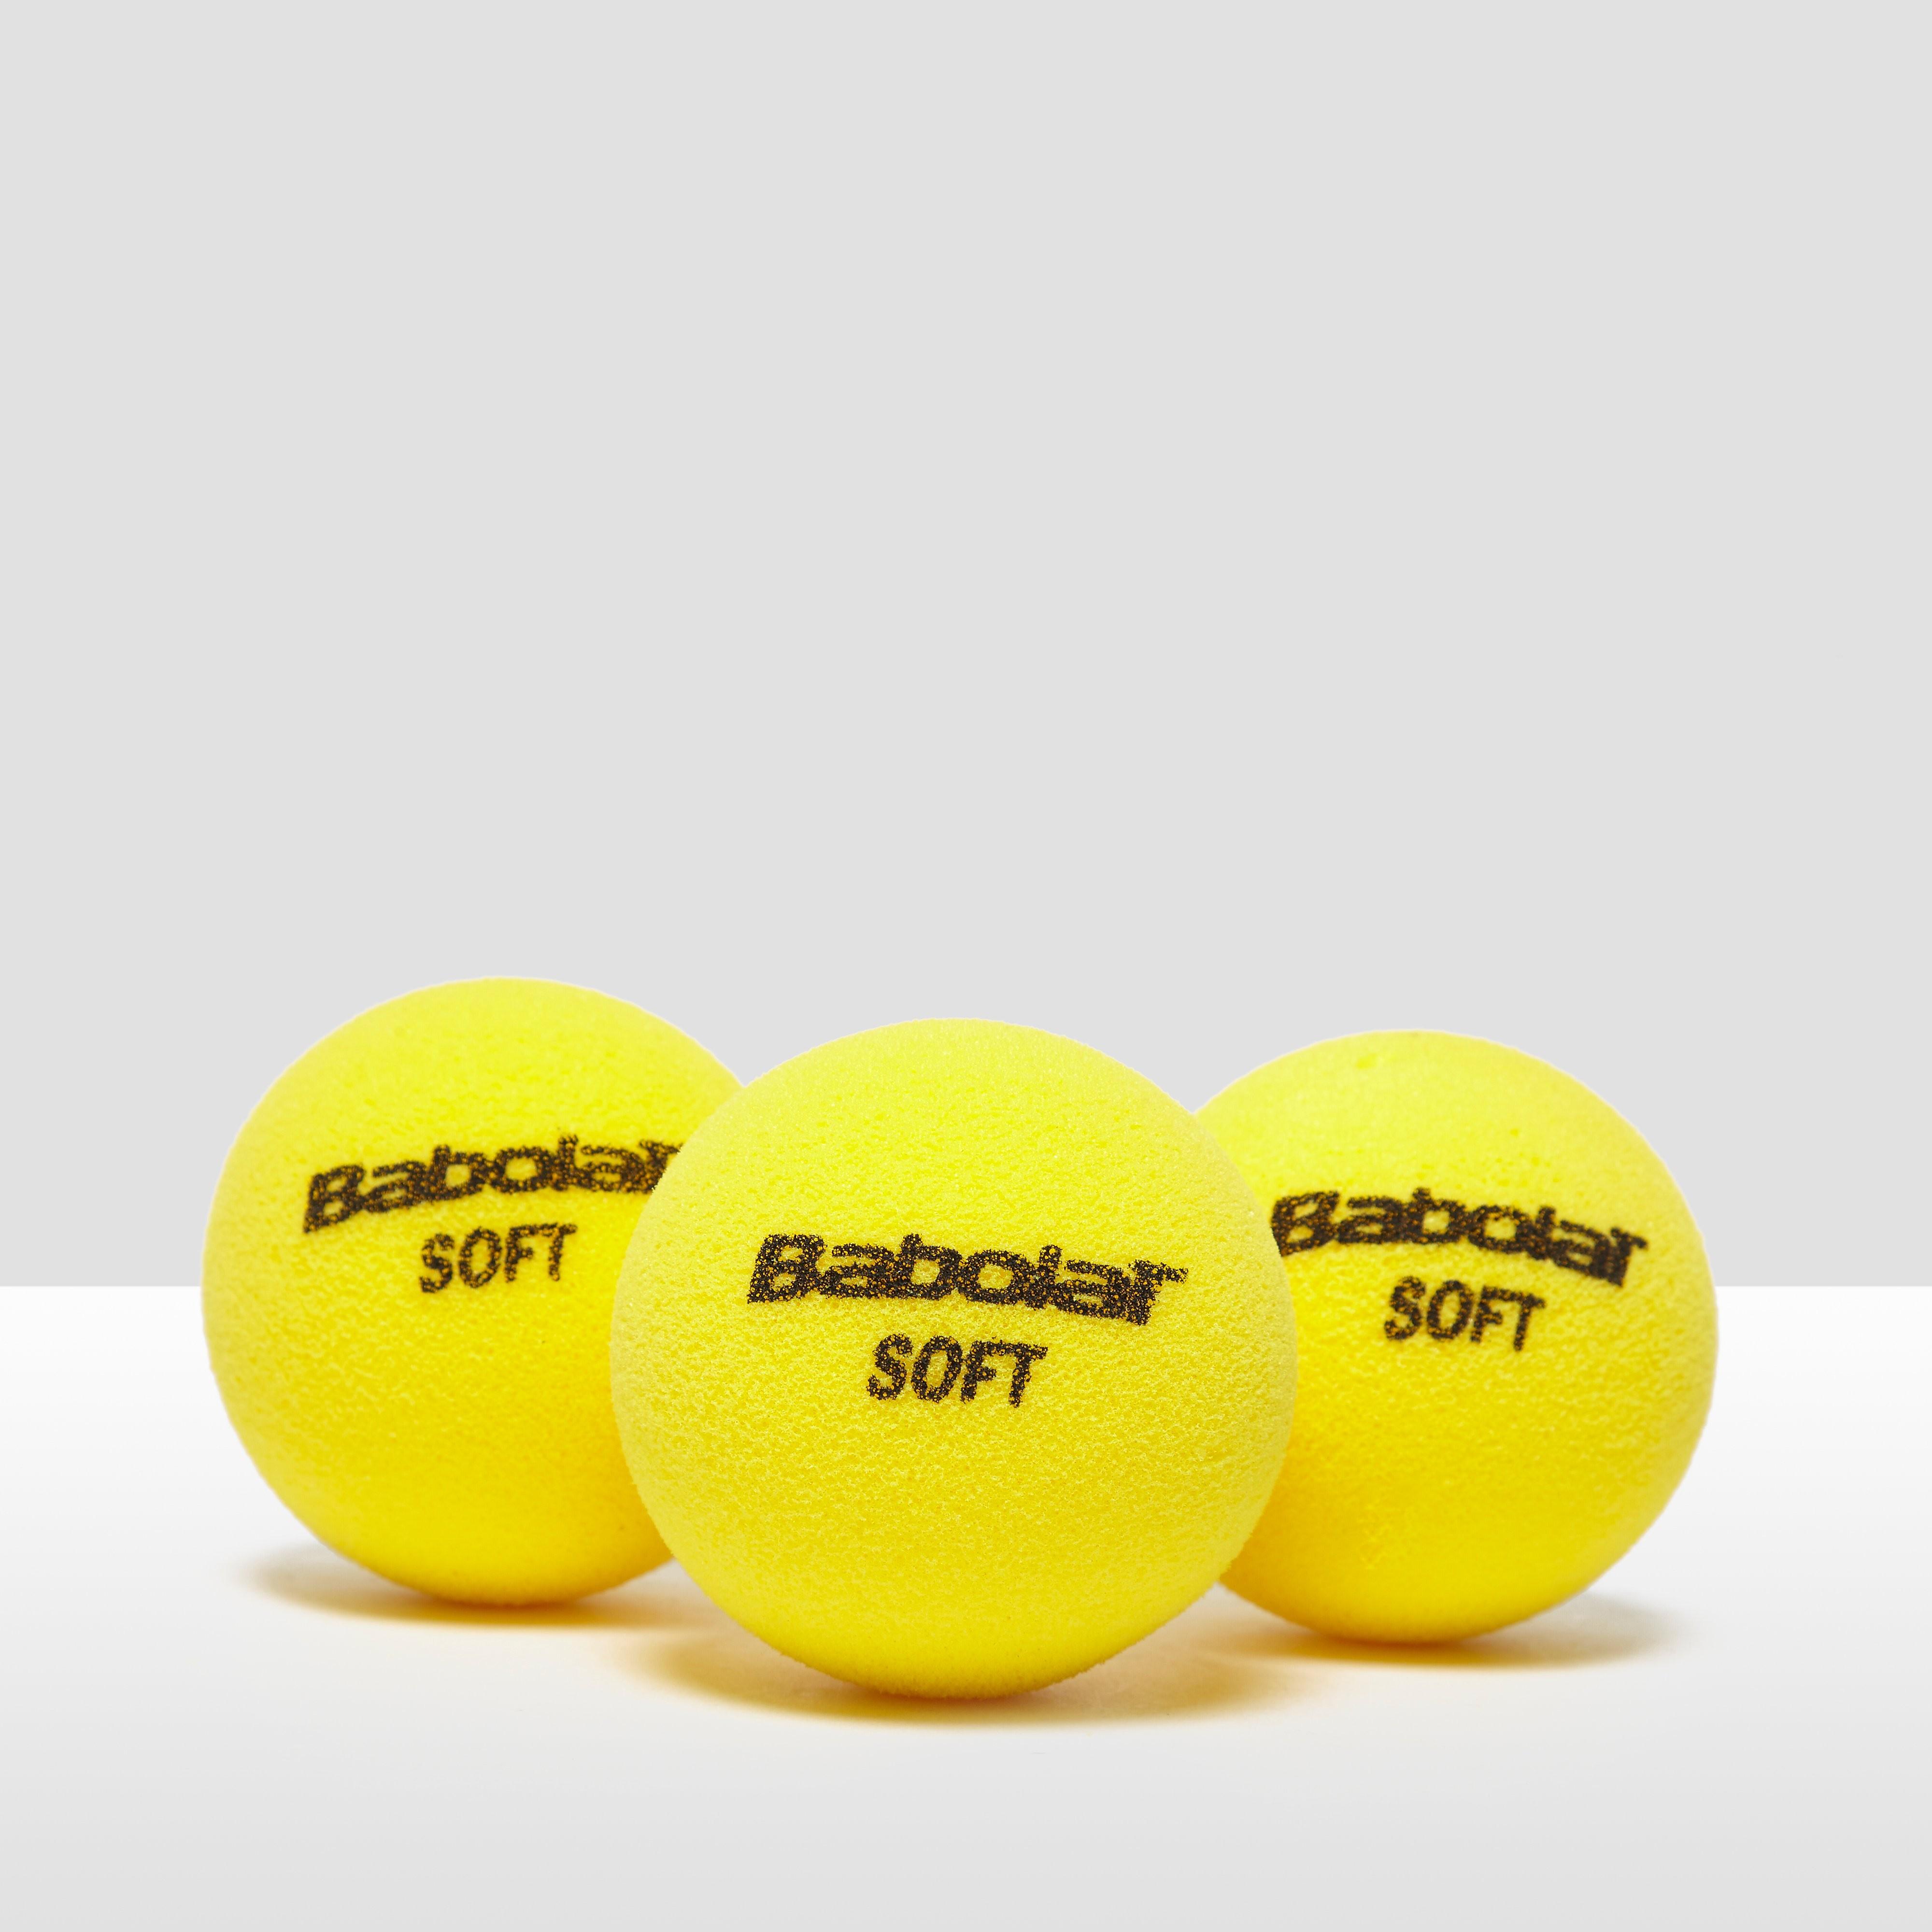 Babolat Soft Foam x3 Tennis Balls